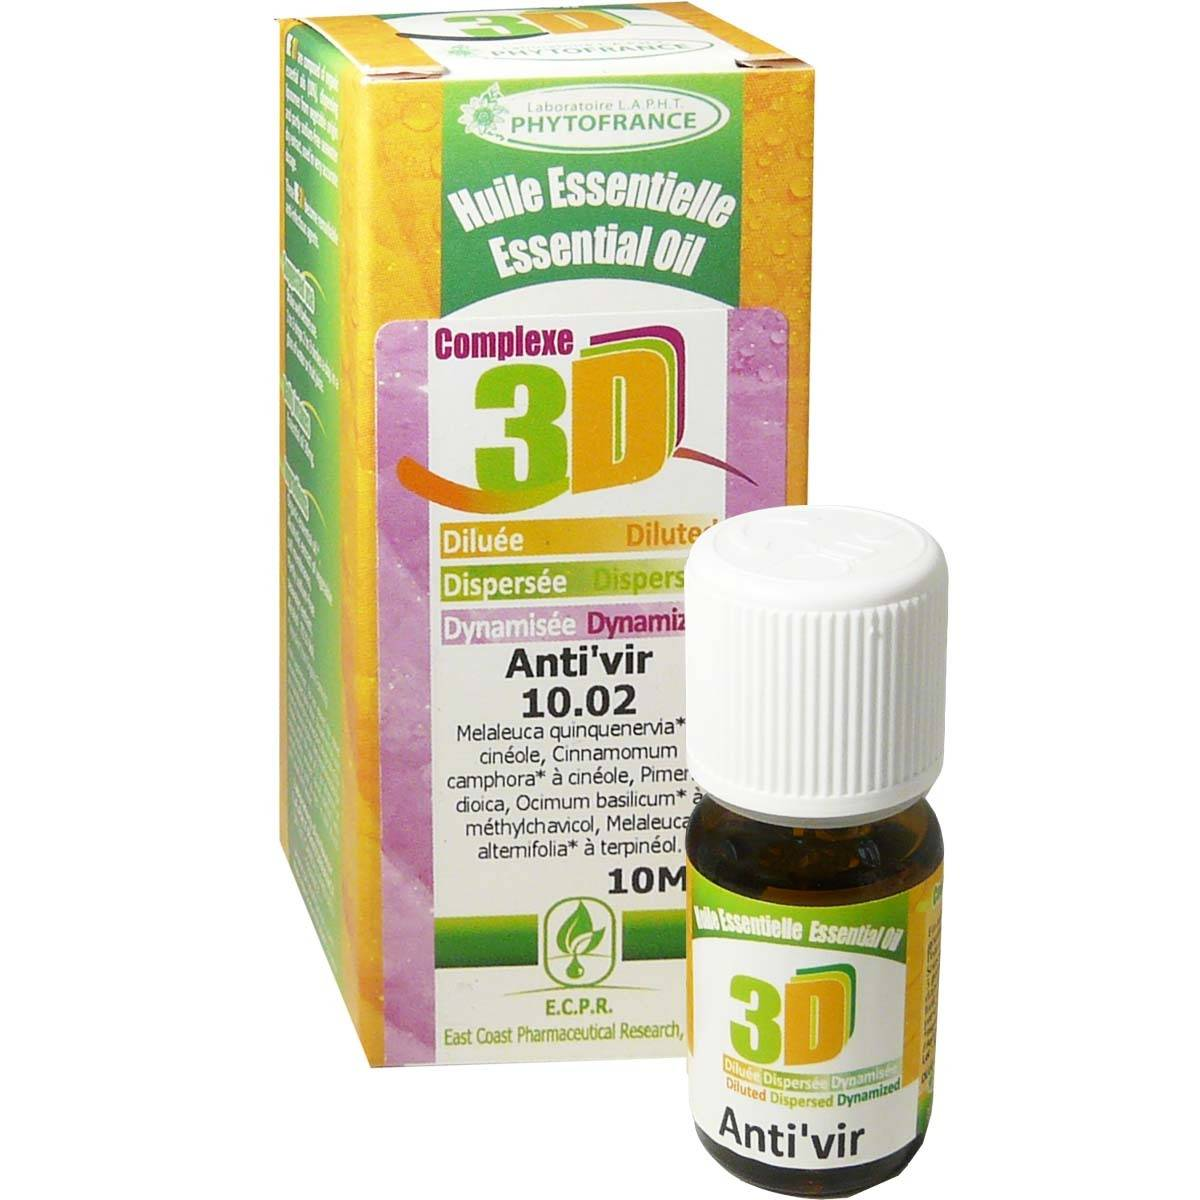 Phytofrance huile essentielle complexe 3d anti'vir 10ml